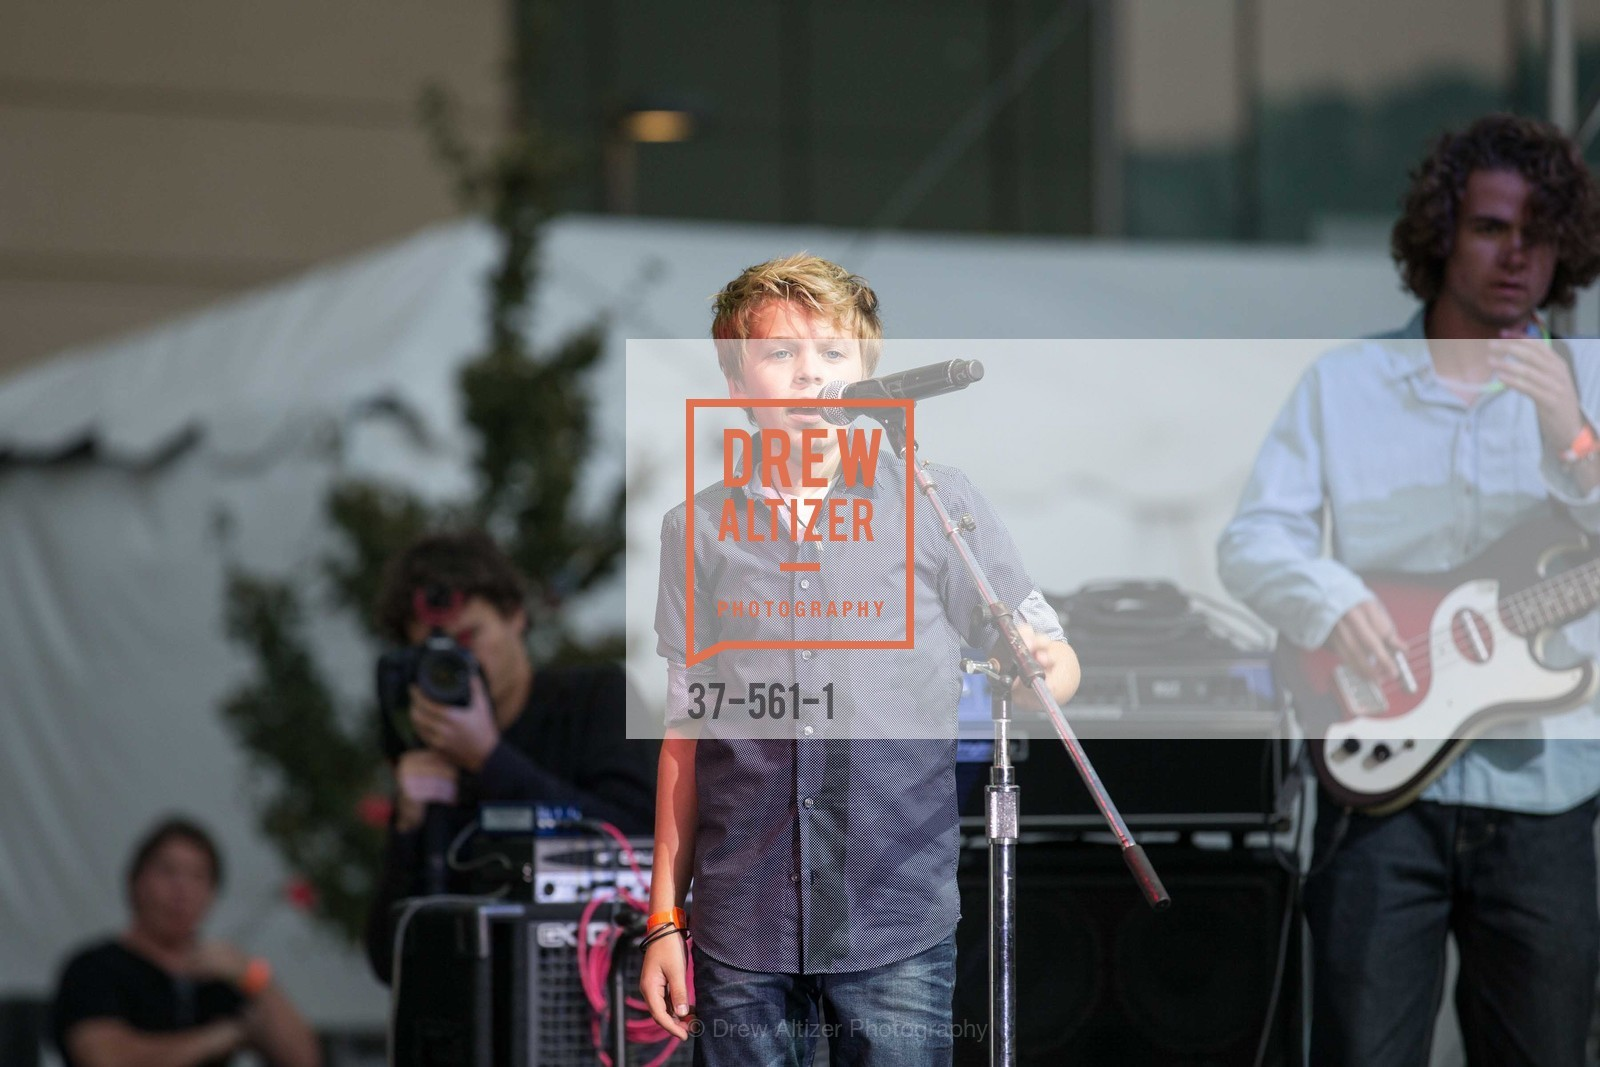 Performance By WJM, Photo #37-561-1